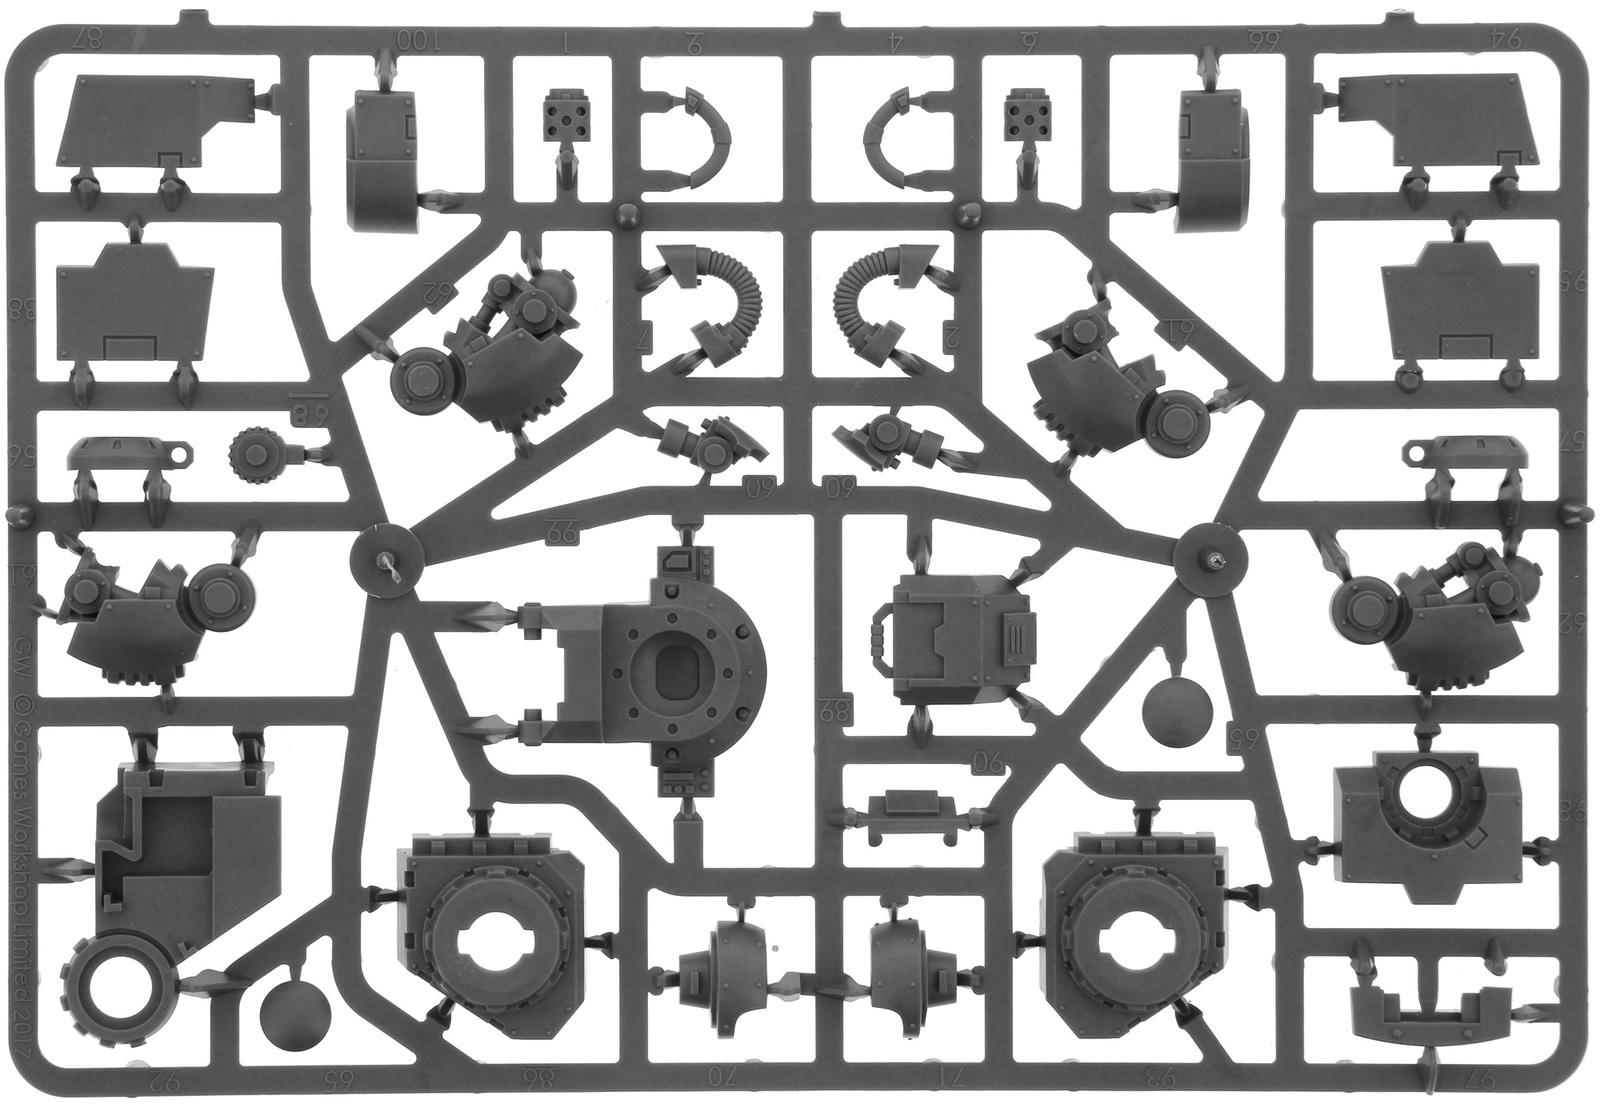 Warhammer 40,000 : Space Marine Primaris Redemptor Dreadnought image